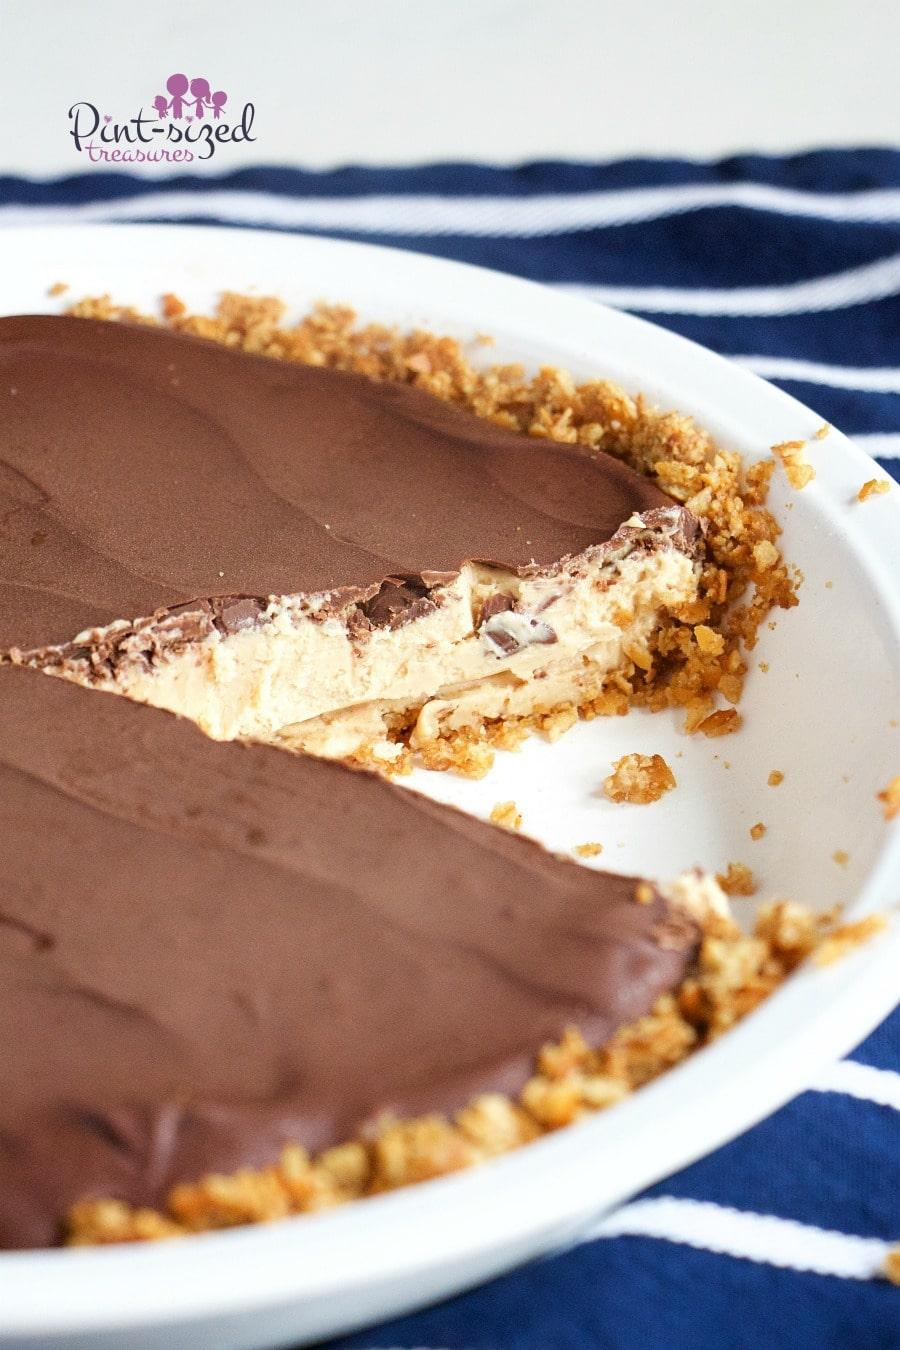 Peanut Butter Chocolate Cheesecake With Pretzel Crust